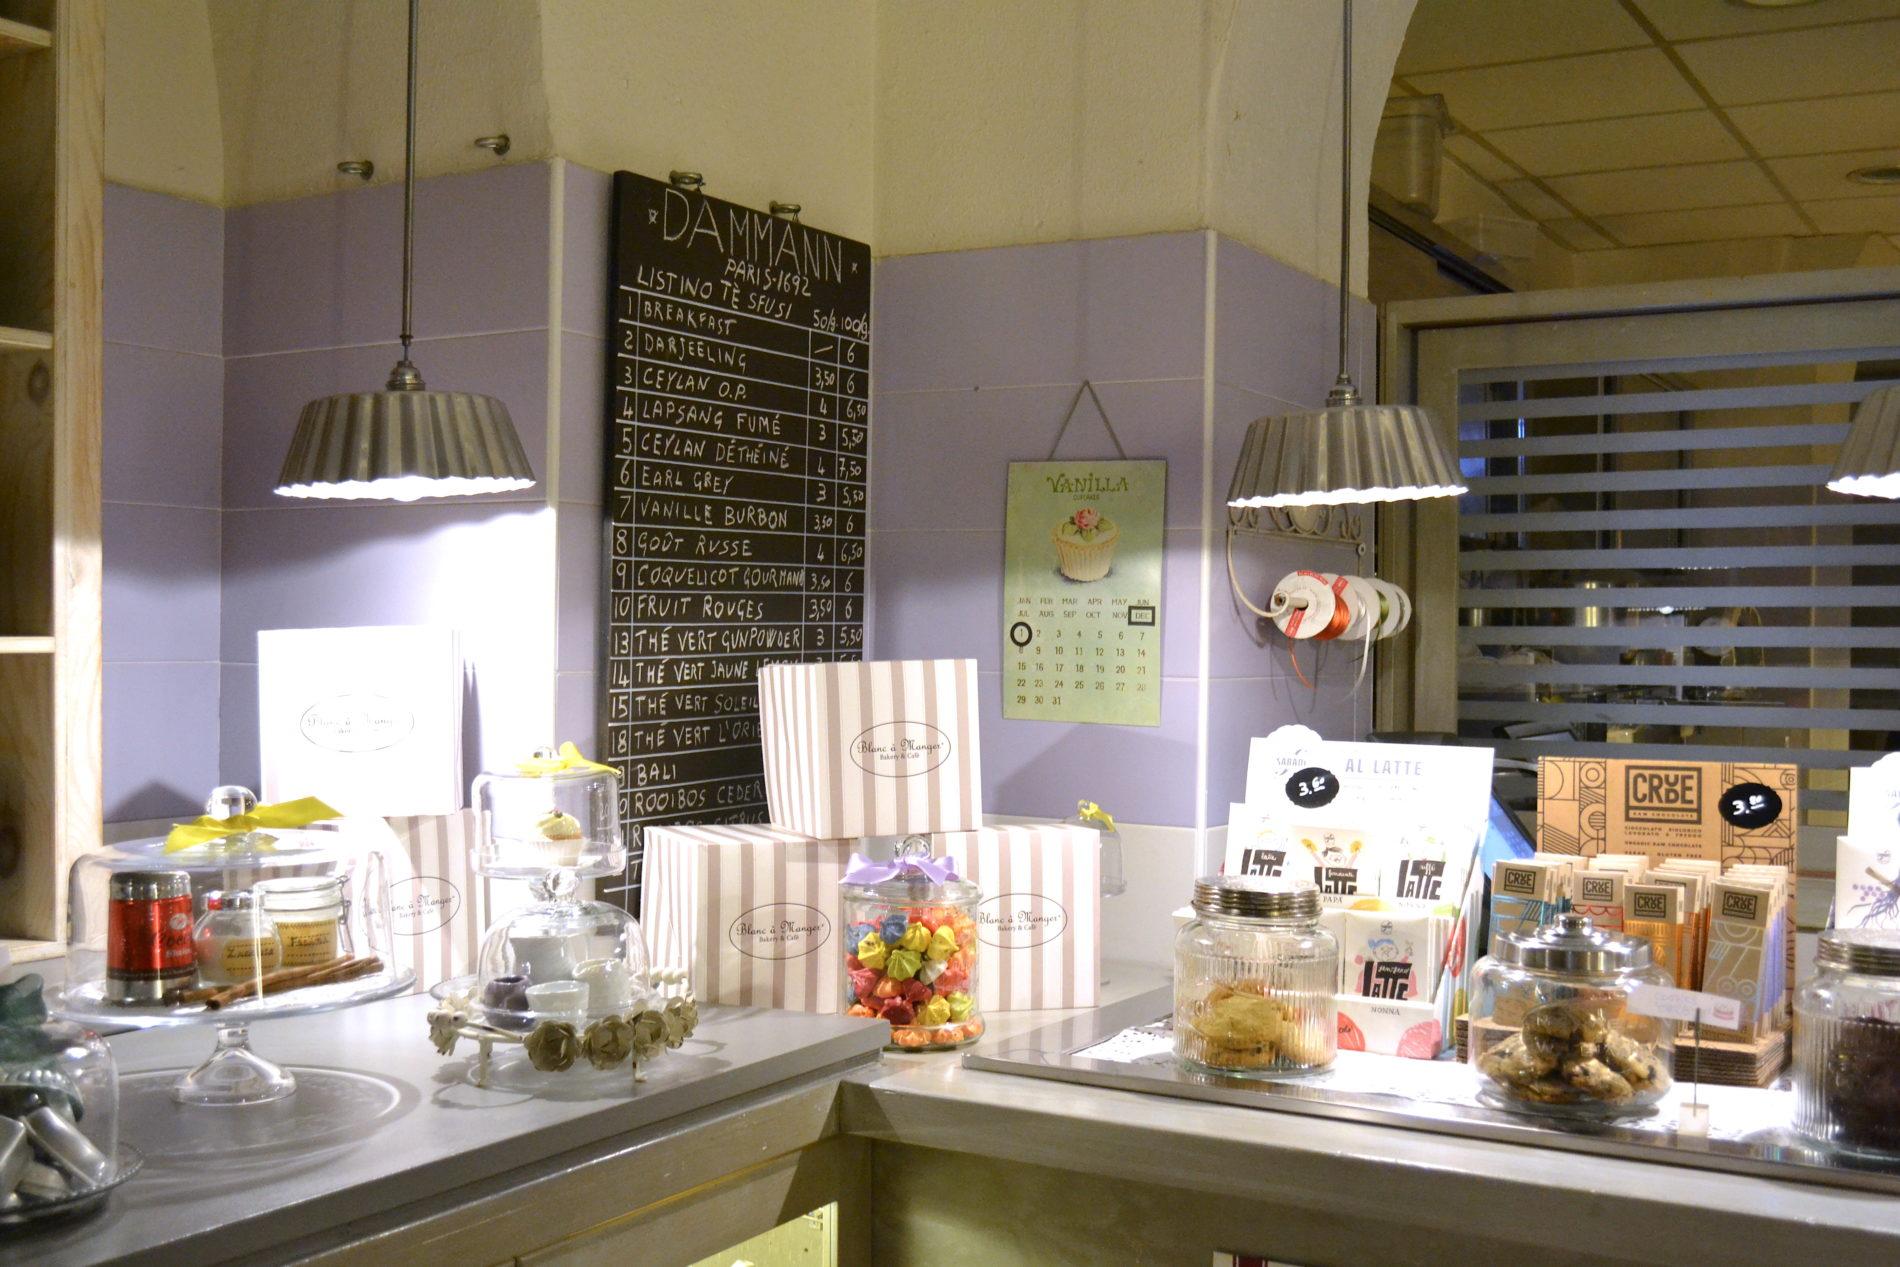 blanc a manger bakery a Catania